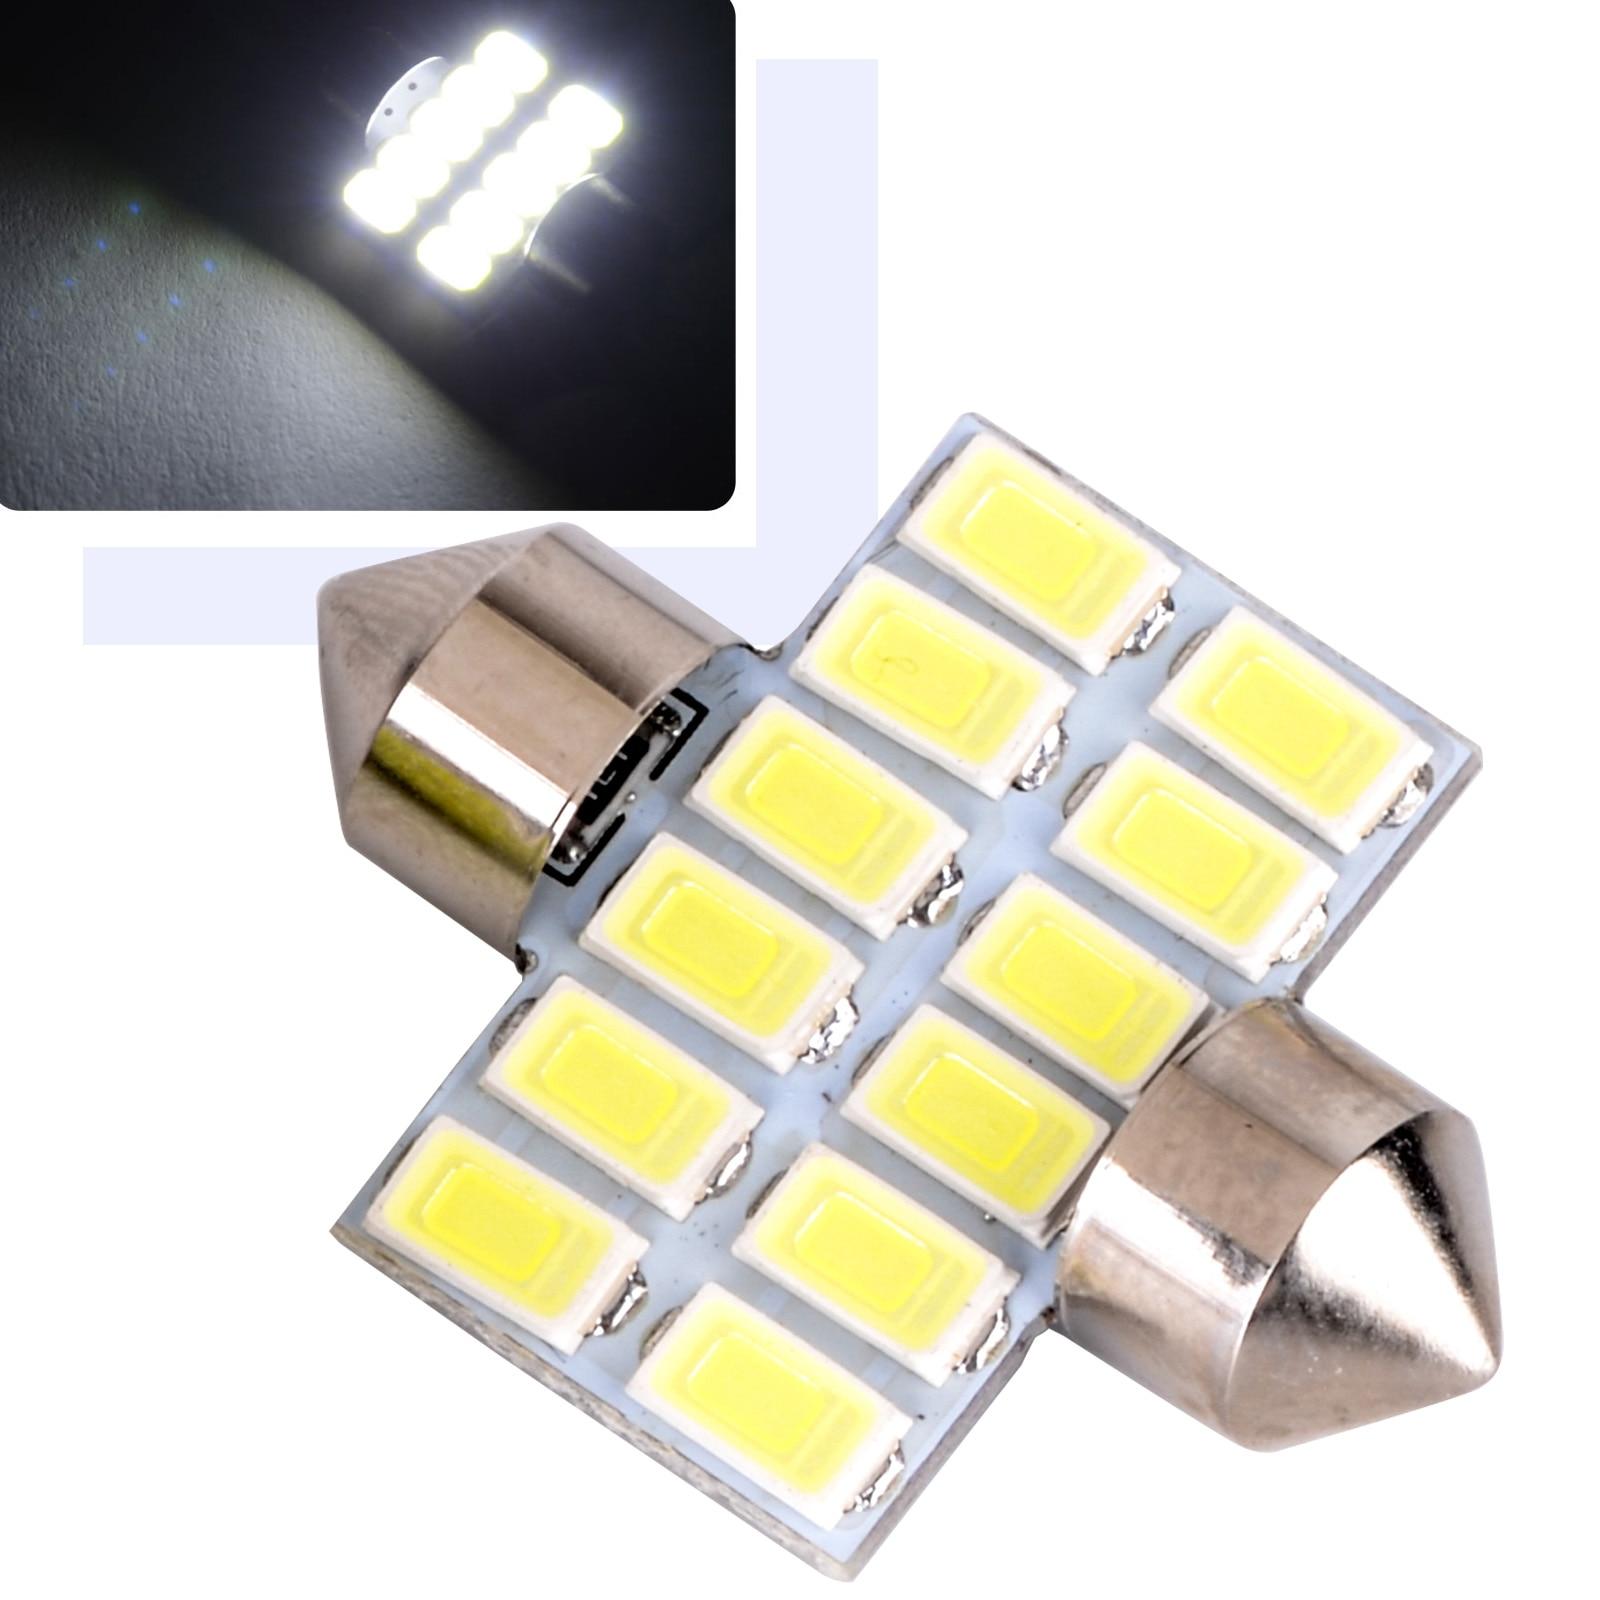 1x 12V 31mm 5630 12 SMD Car Festoon Lamp Warm White Light Dome Interior Reading LED Bulb DC 12V Car Styling jrled g4 3w 300lm 9 x smd 5630 led white light car reading lamp ac dc 12v